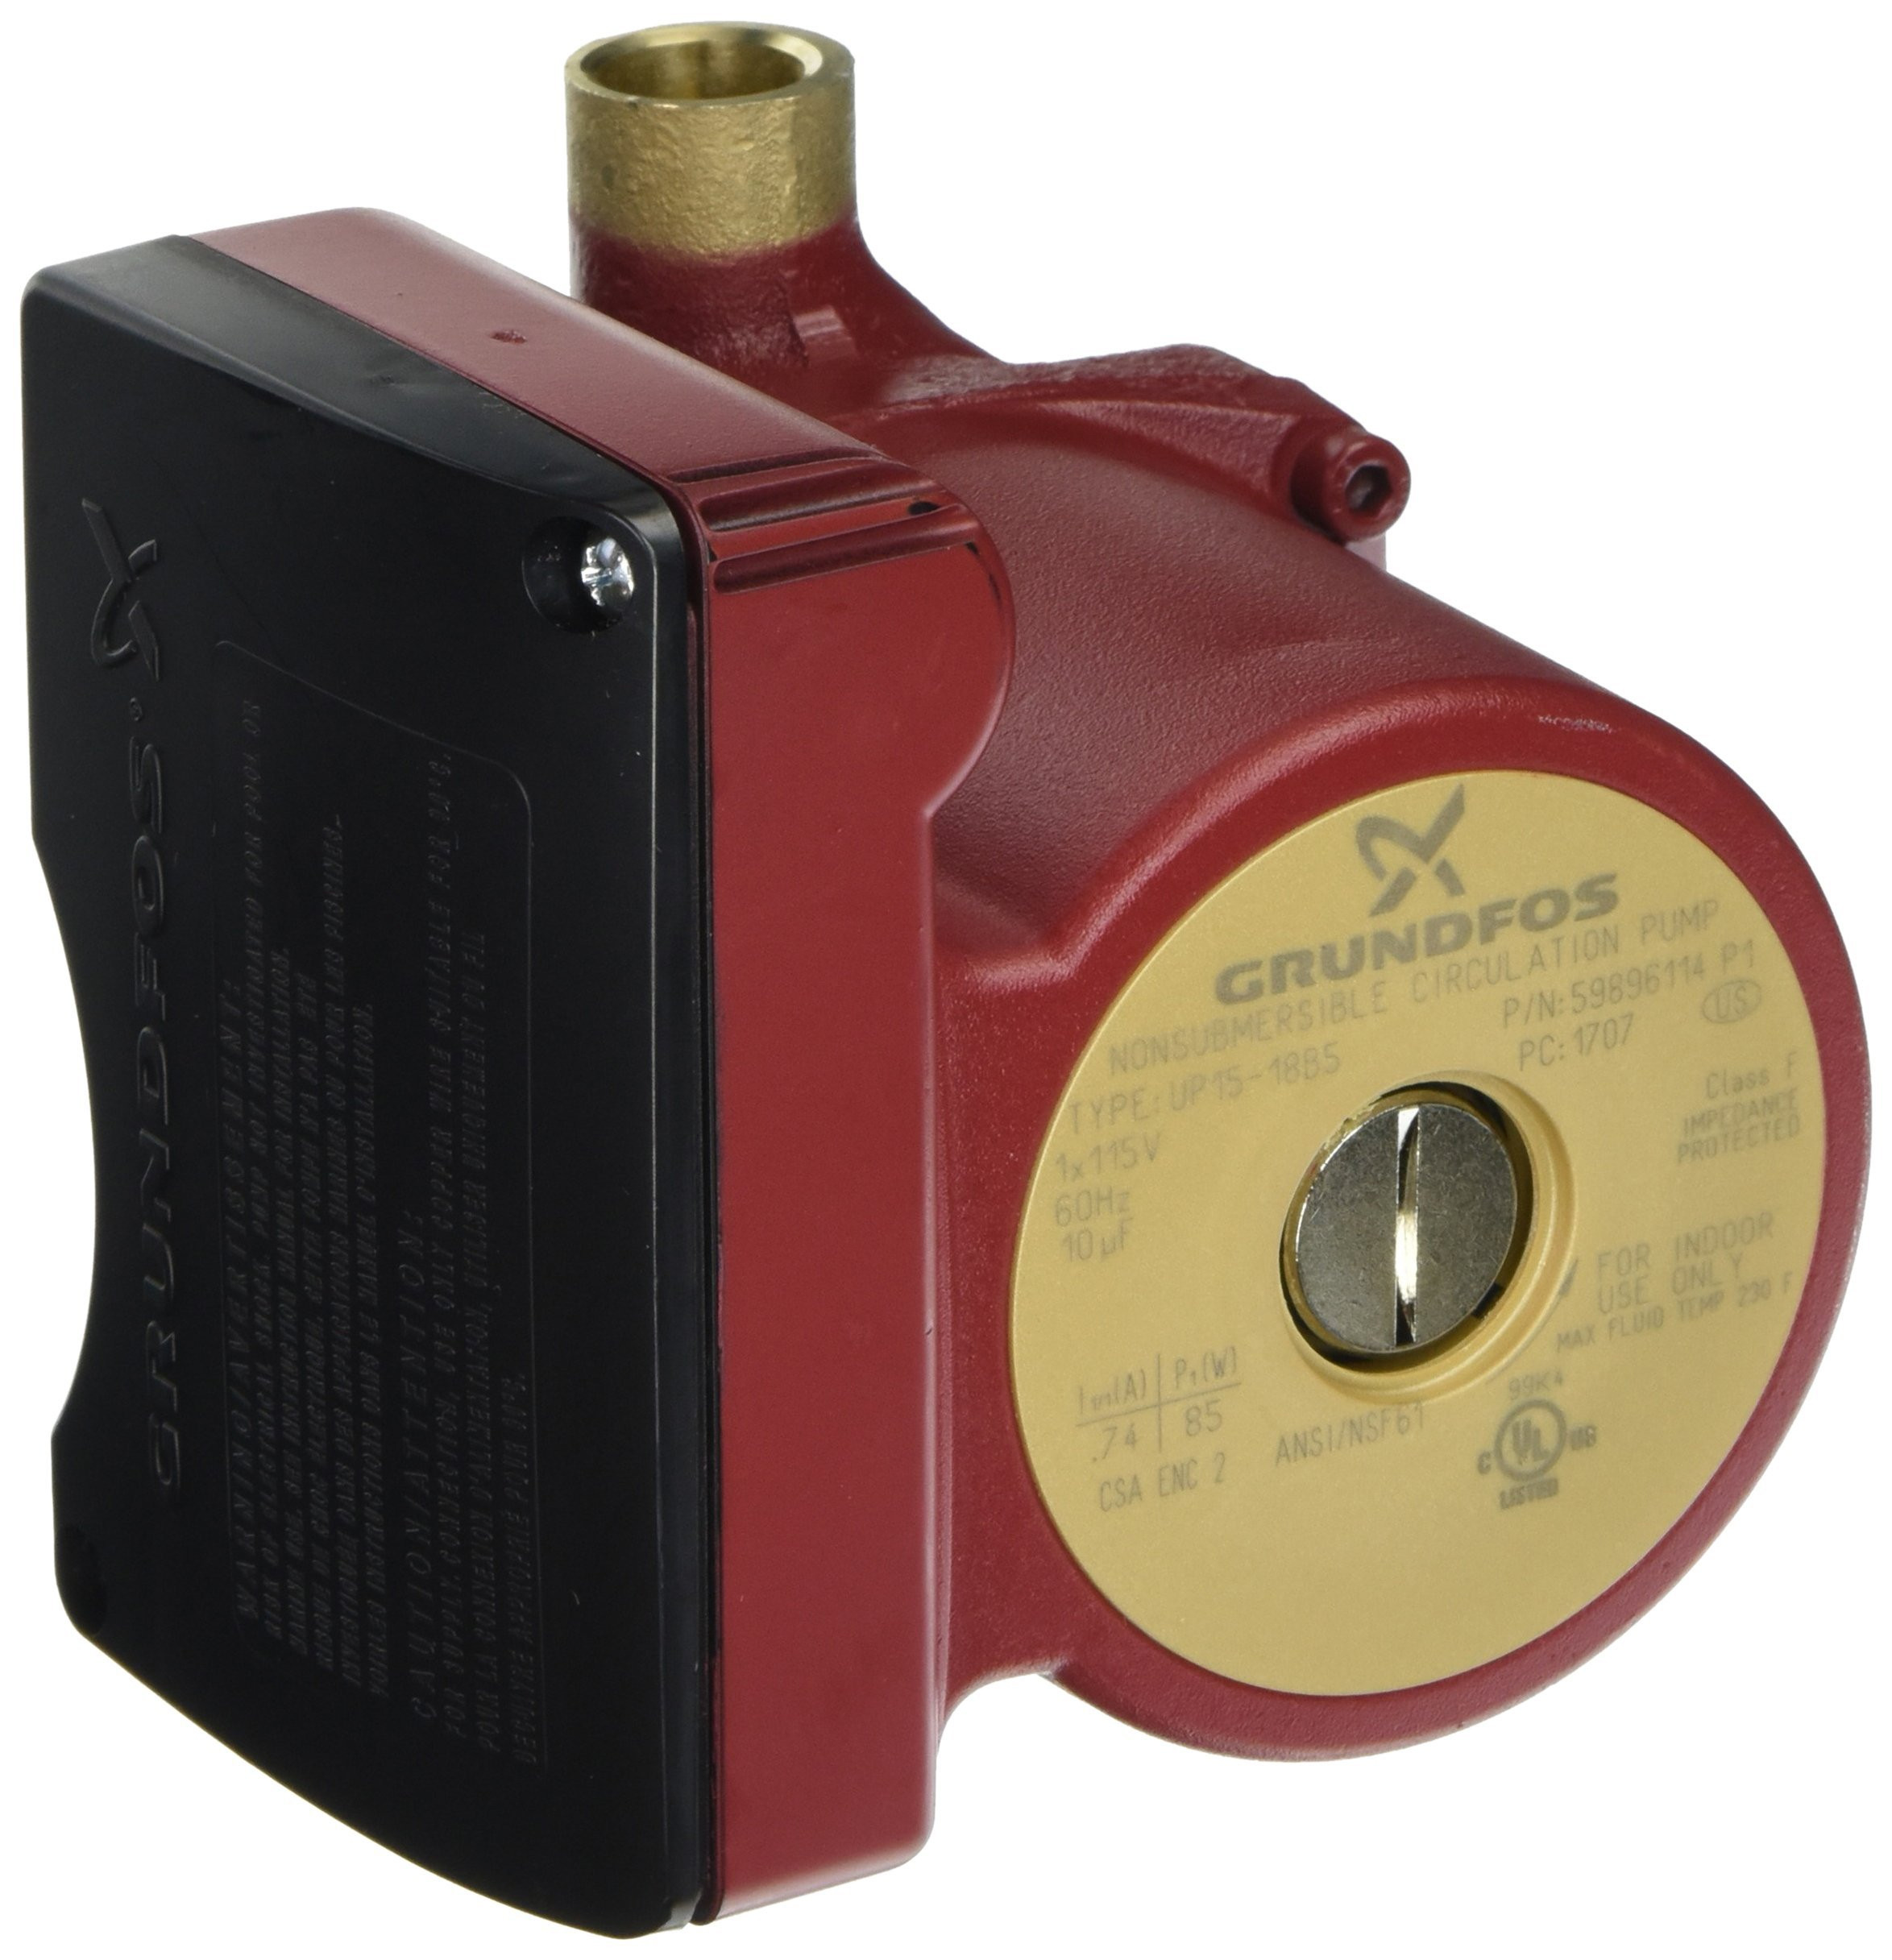 Grundfos UP15-18B5 (59896114) Pump, 1/2'' Sweat End Open System Circulator, 1/25 HP 115V - Bronze